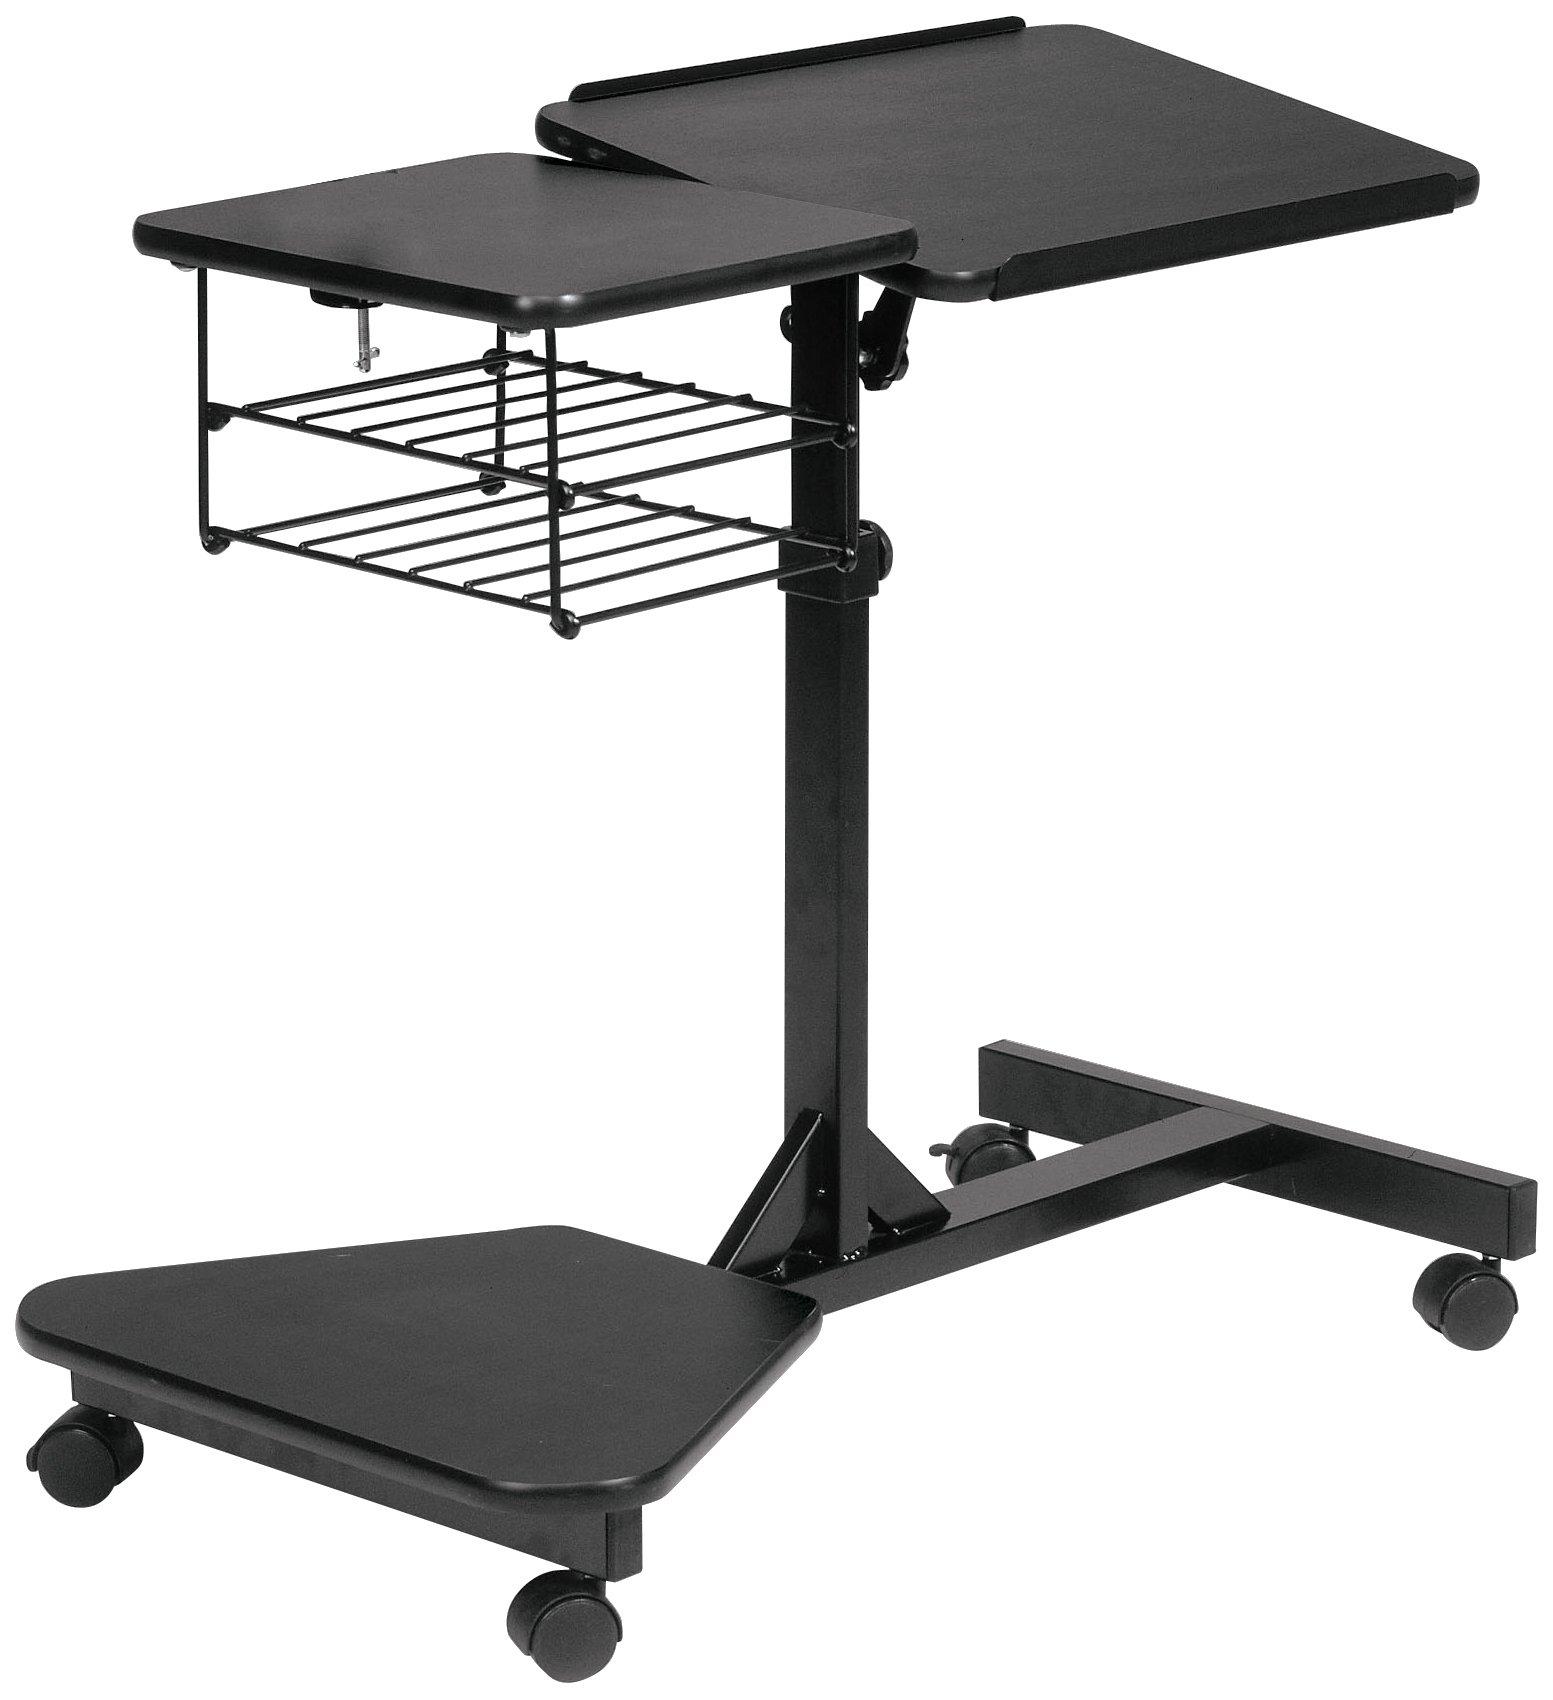 Balt 42052 Lapmaster Deluxe Laptop Stand